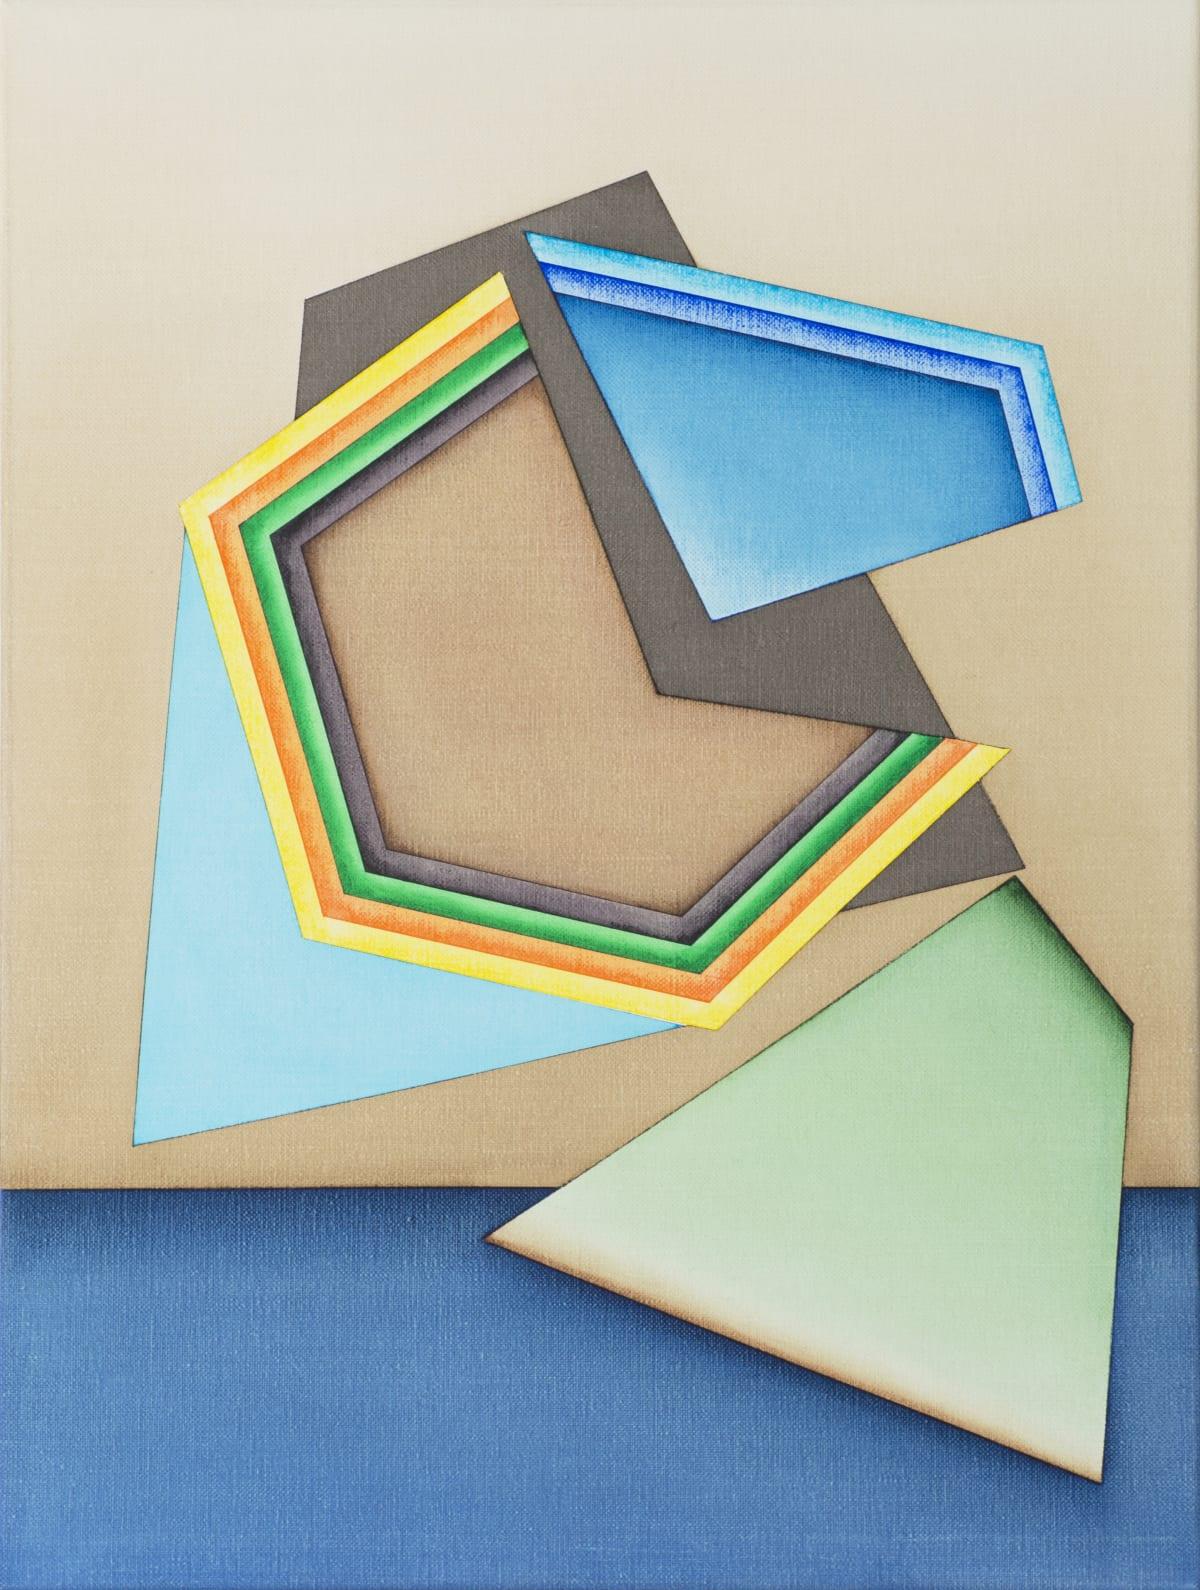 Selma Parlour, Smack Dab II, 2019, oil on linen, 41 x 30.5 cm